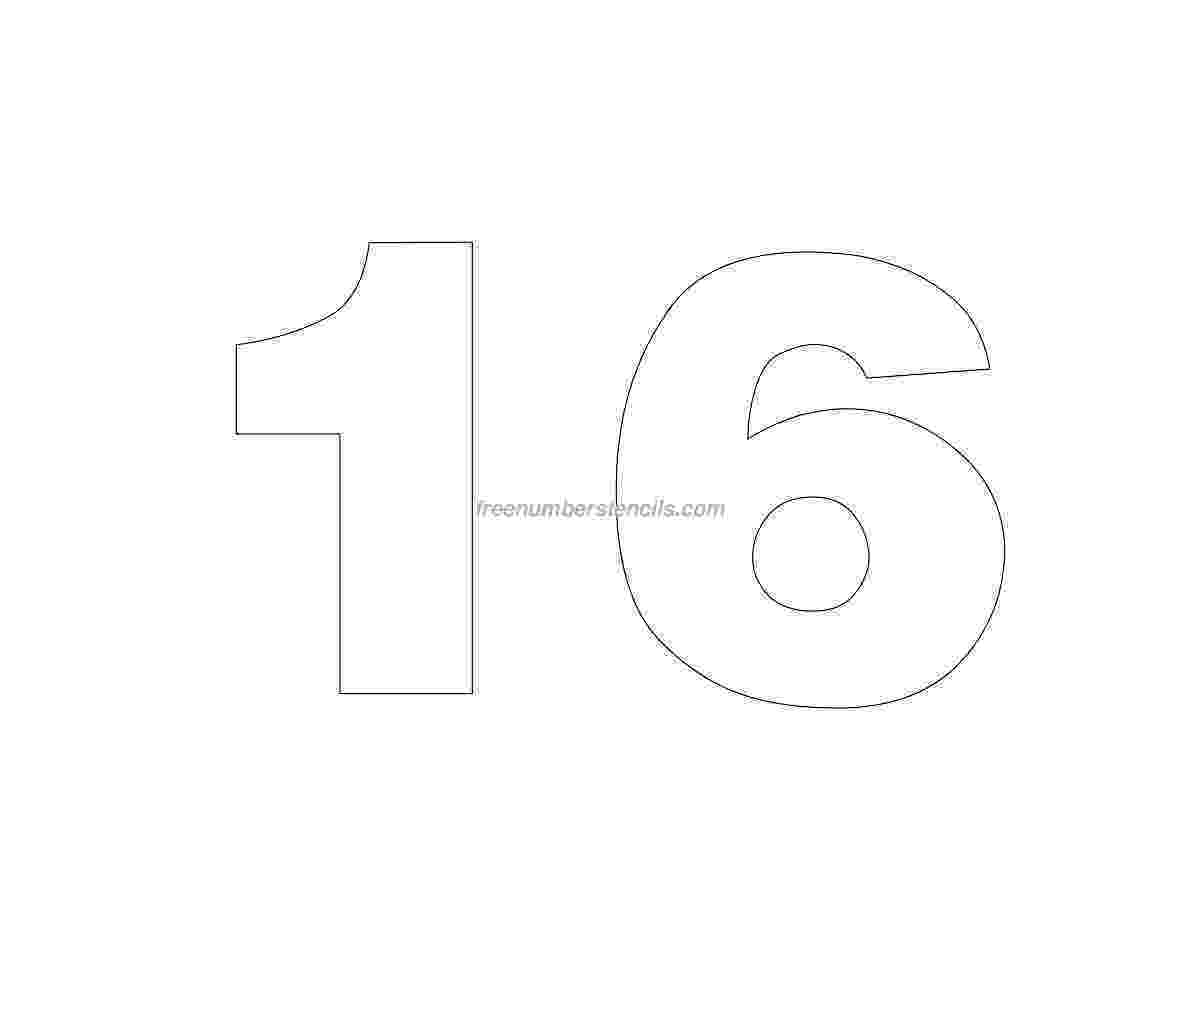 number 16 template helvetica number stencils archives freenumberstencilscom template number 16